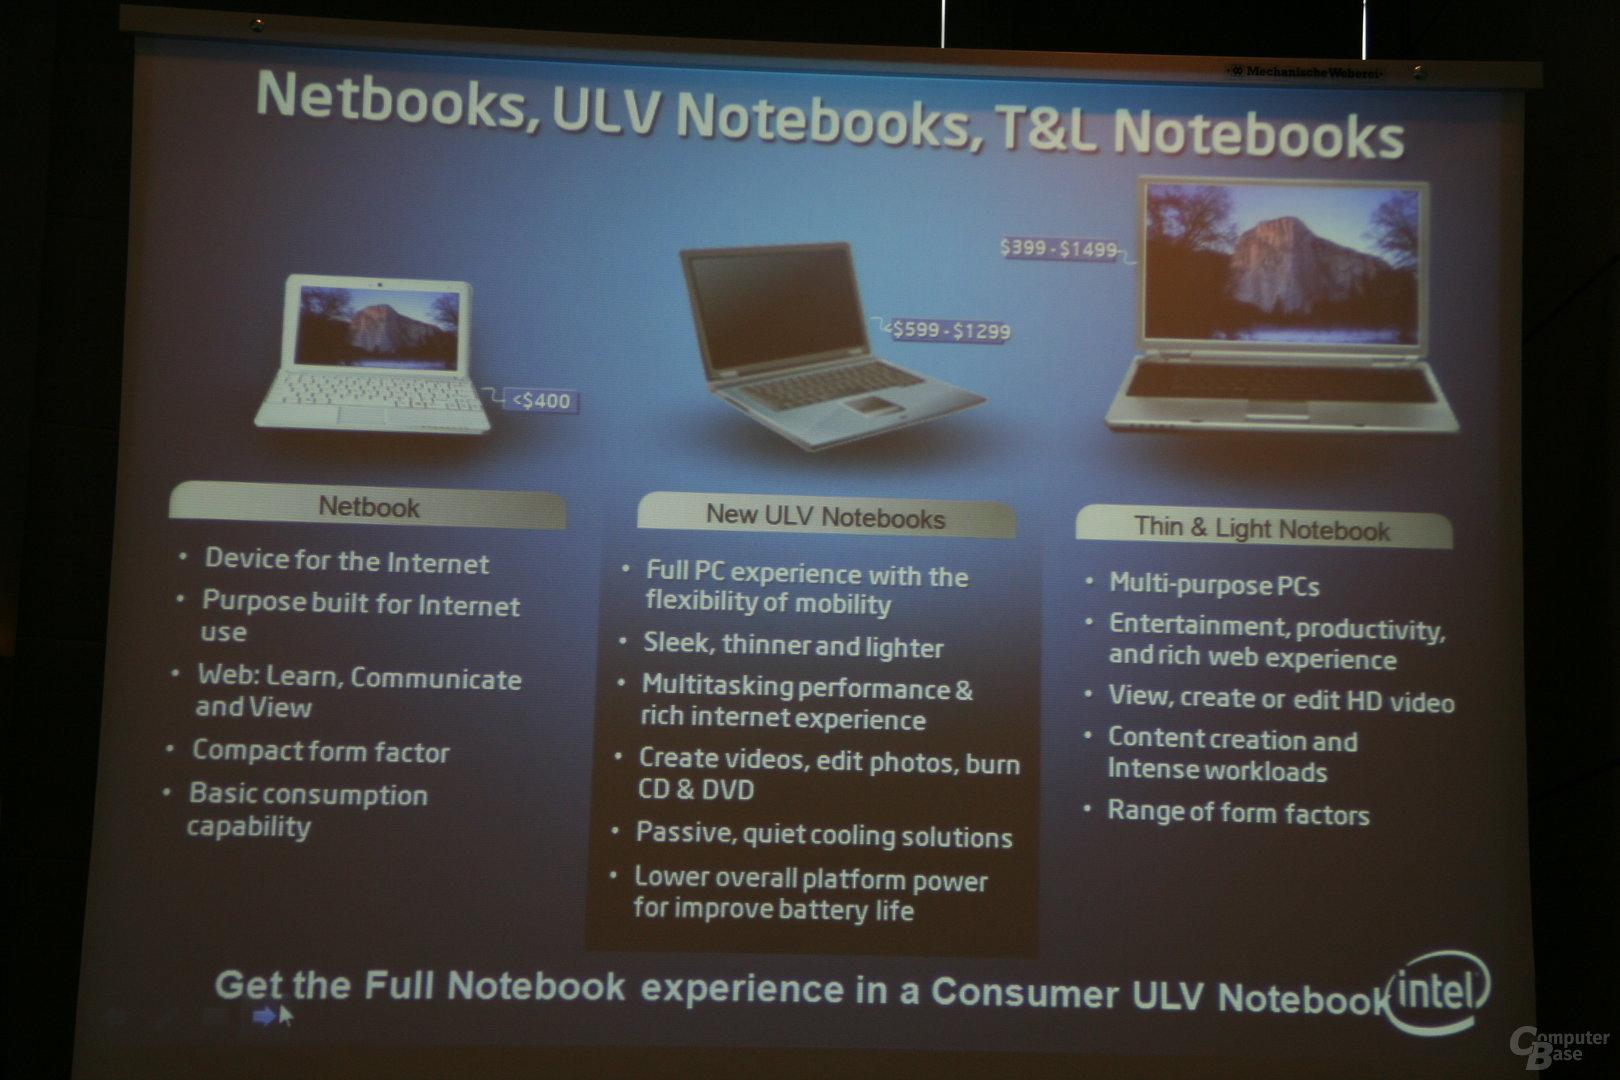 Drei Klassen an Notebooks in Zukunft